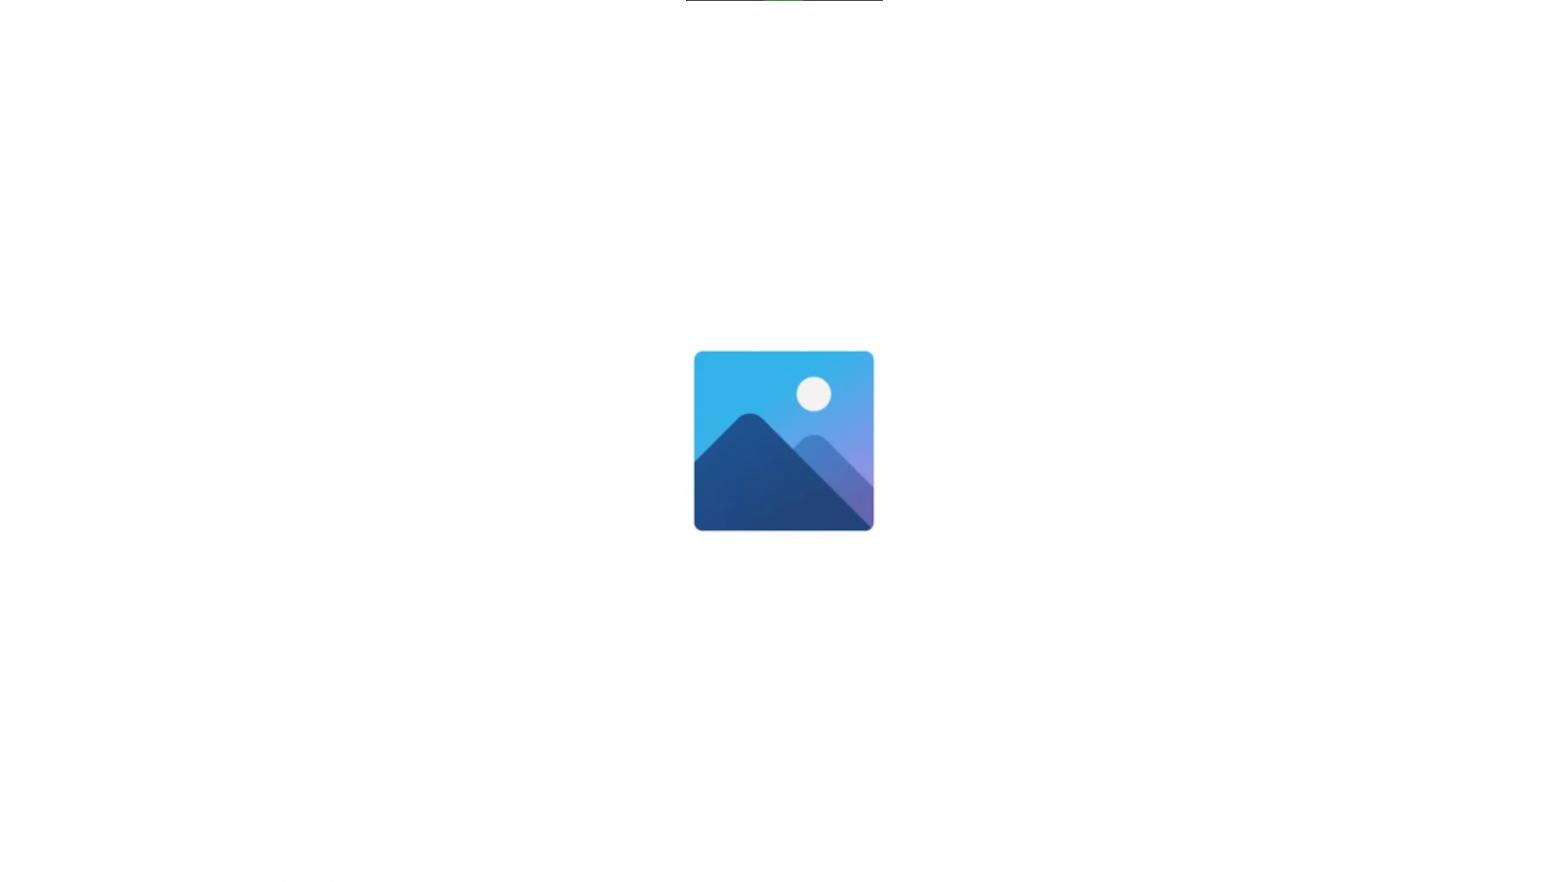 windows-11-fotos-app-re-design:-ist-das-schon-alles?